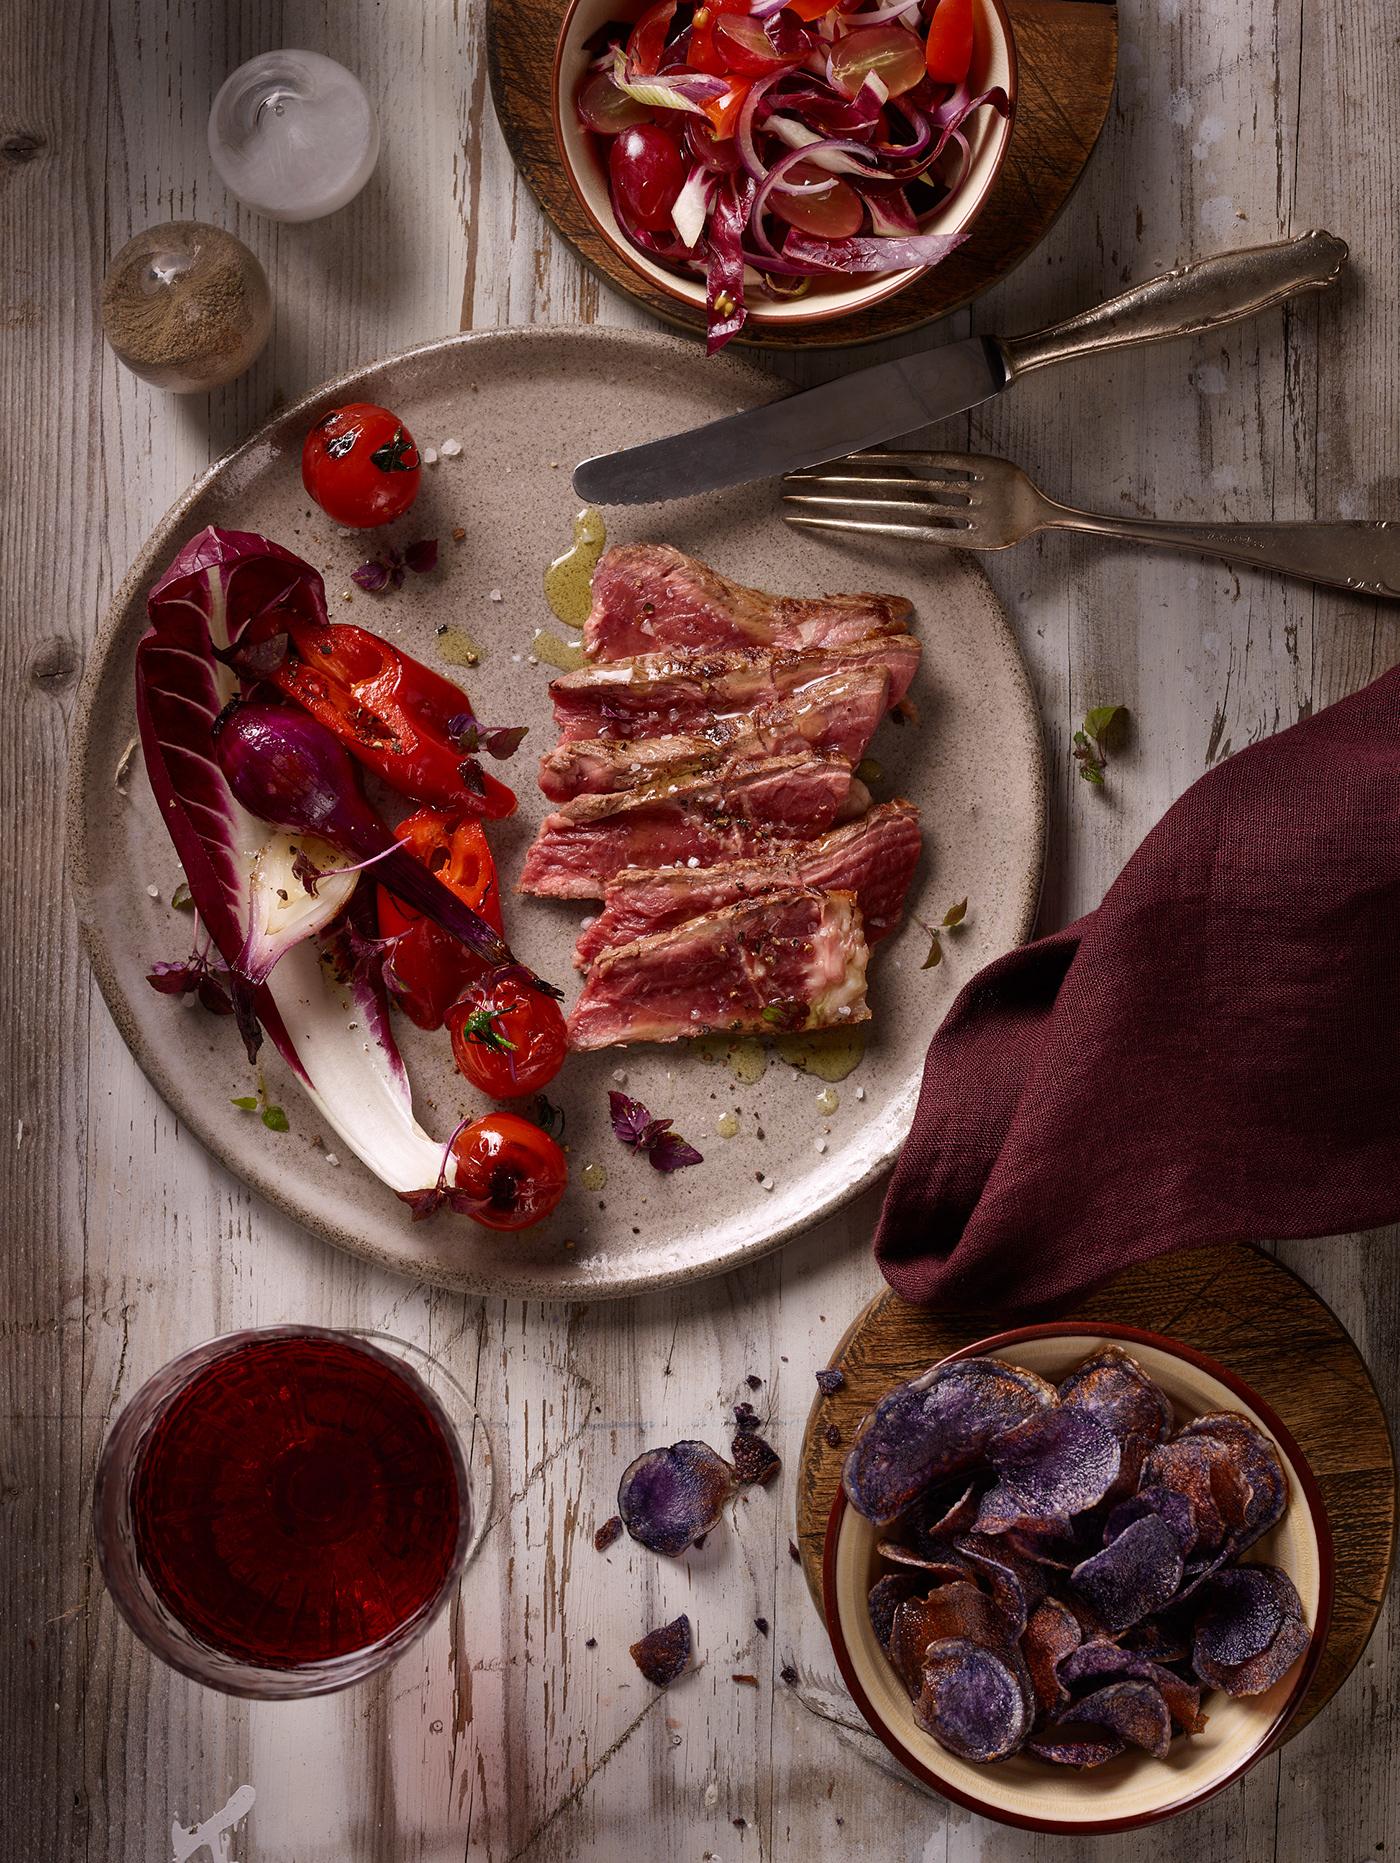 THE DAY / foto Kai Stiepel foodstylist Alissa Poller